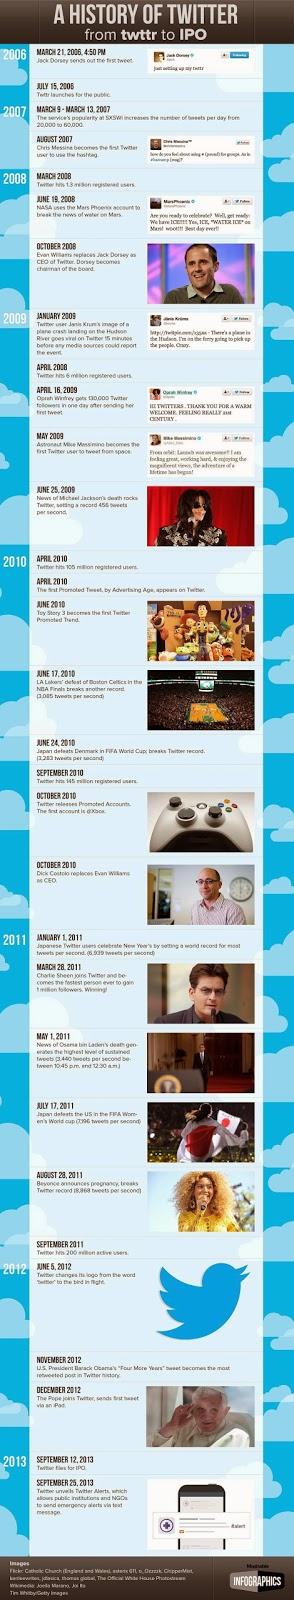 http://mashable.com/2013/10/04/history-twitter/